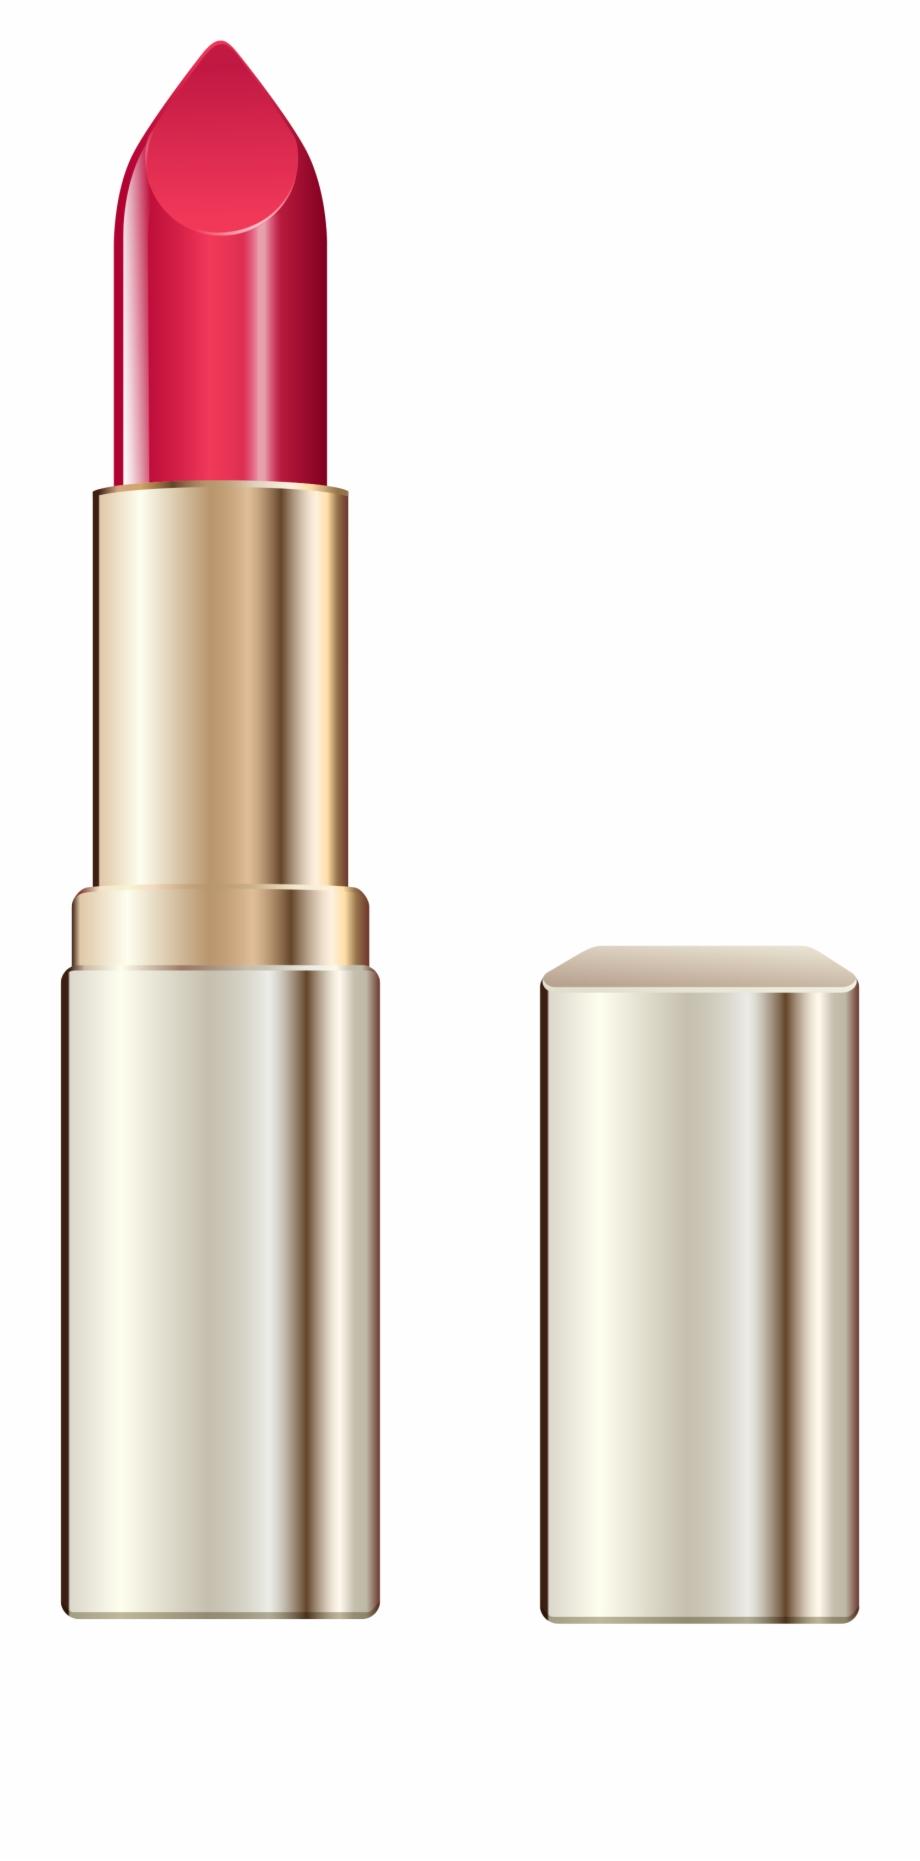 Lipstick clipart png clip art download Pink Lipstick Png Clipart Picture - Lipstick Png File ... clip art download